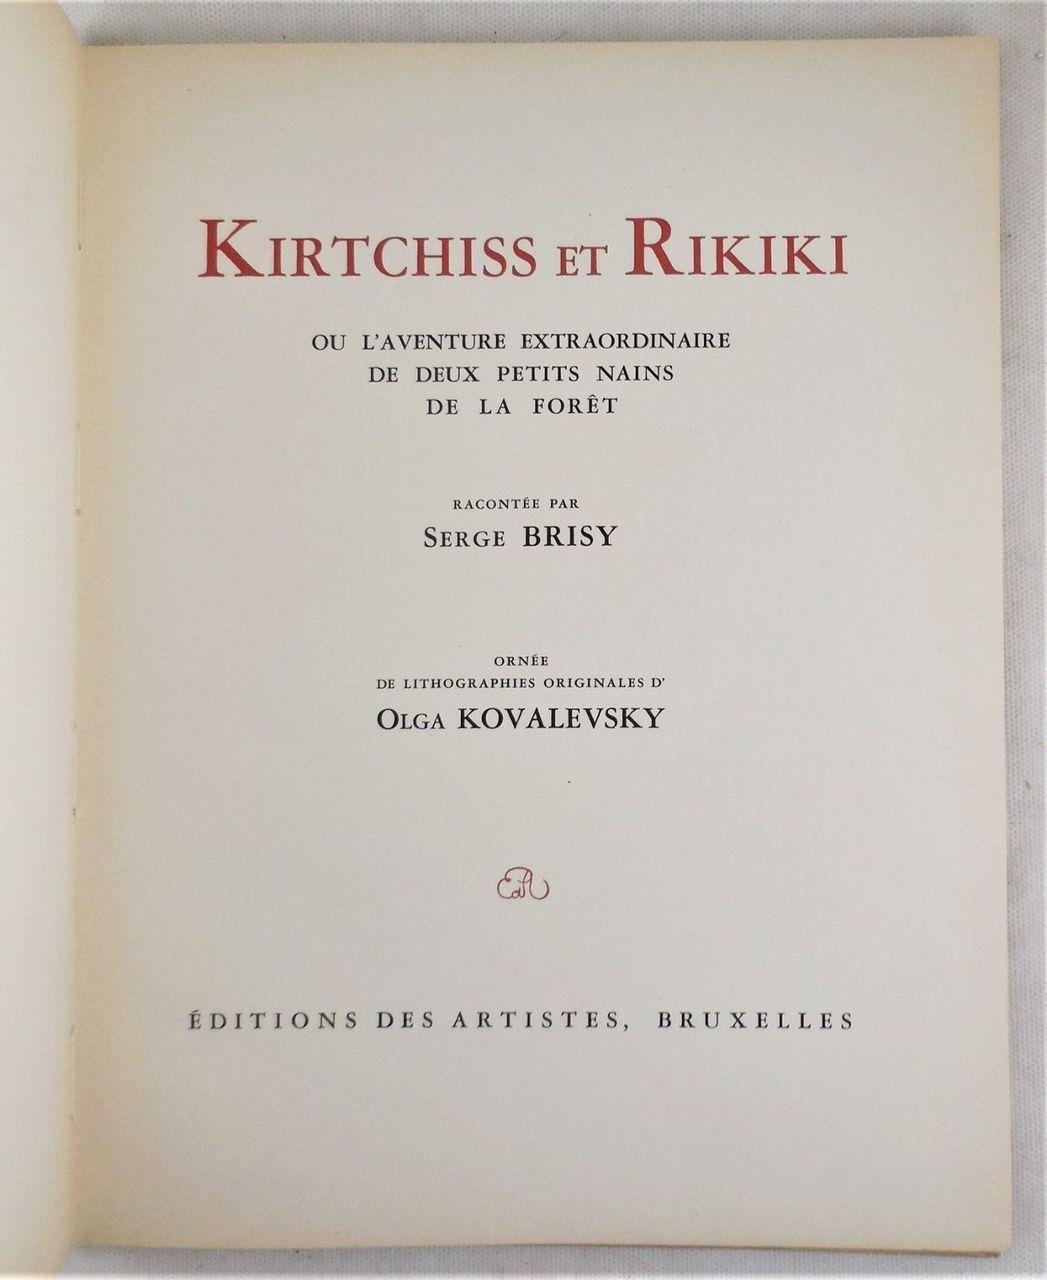 KIRTCHISS ET RIKIKI, by Serge Brisy - 1938 [1st Ed] Kovalevsky Lithos Children